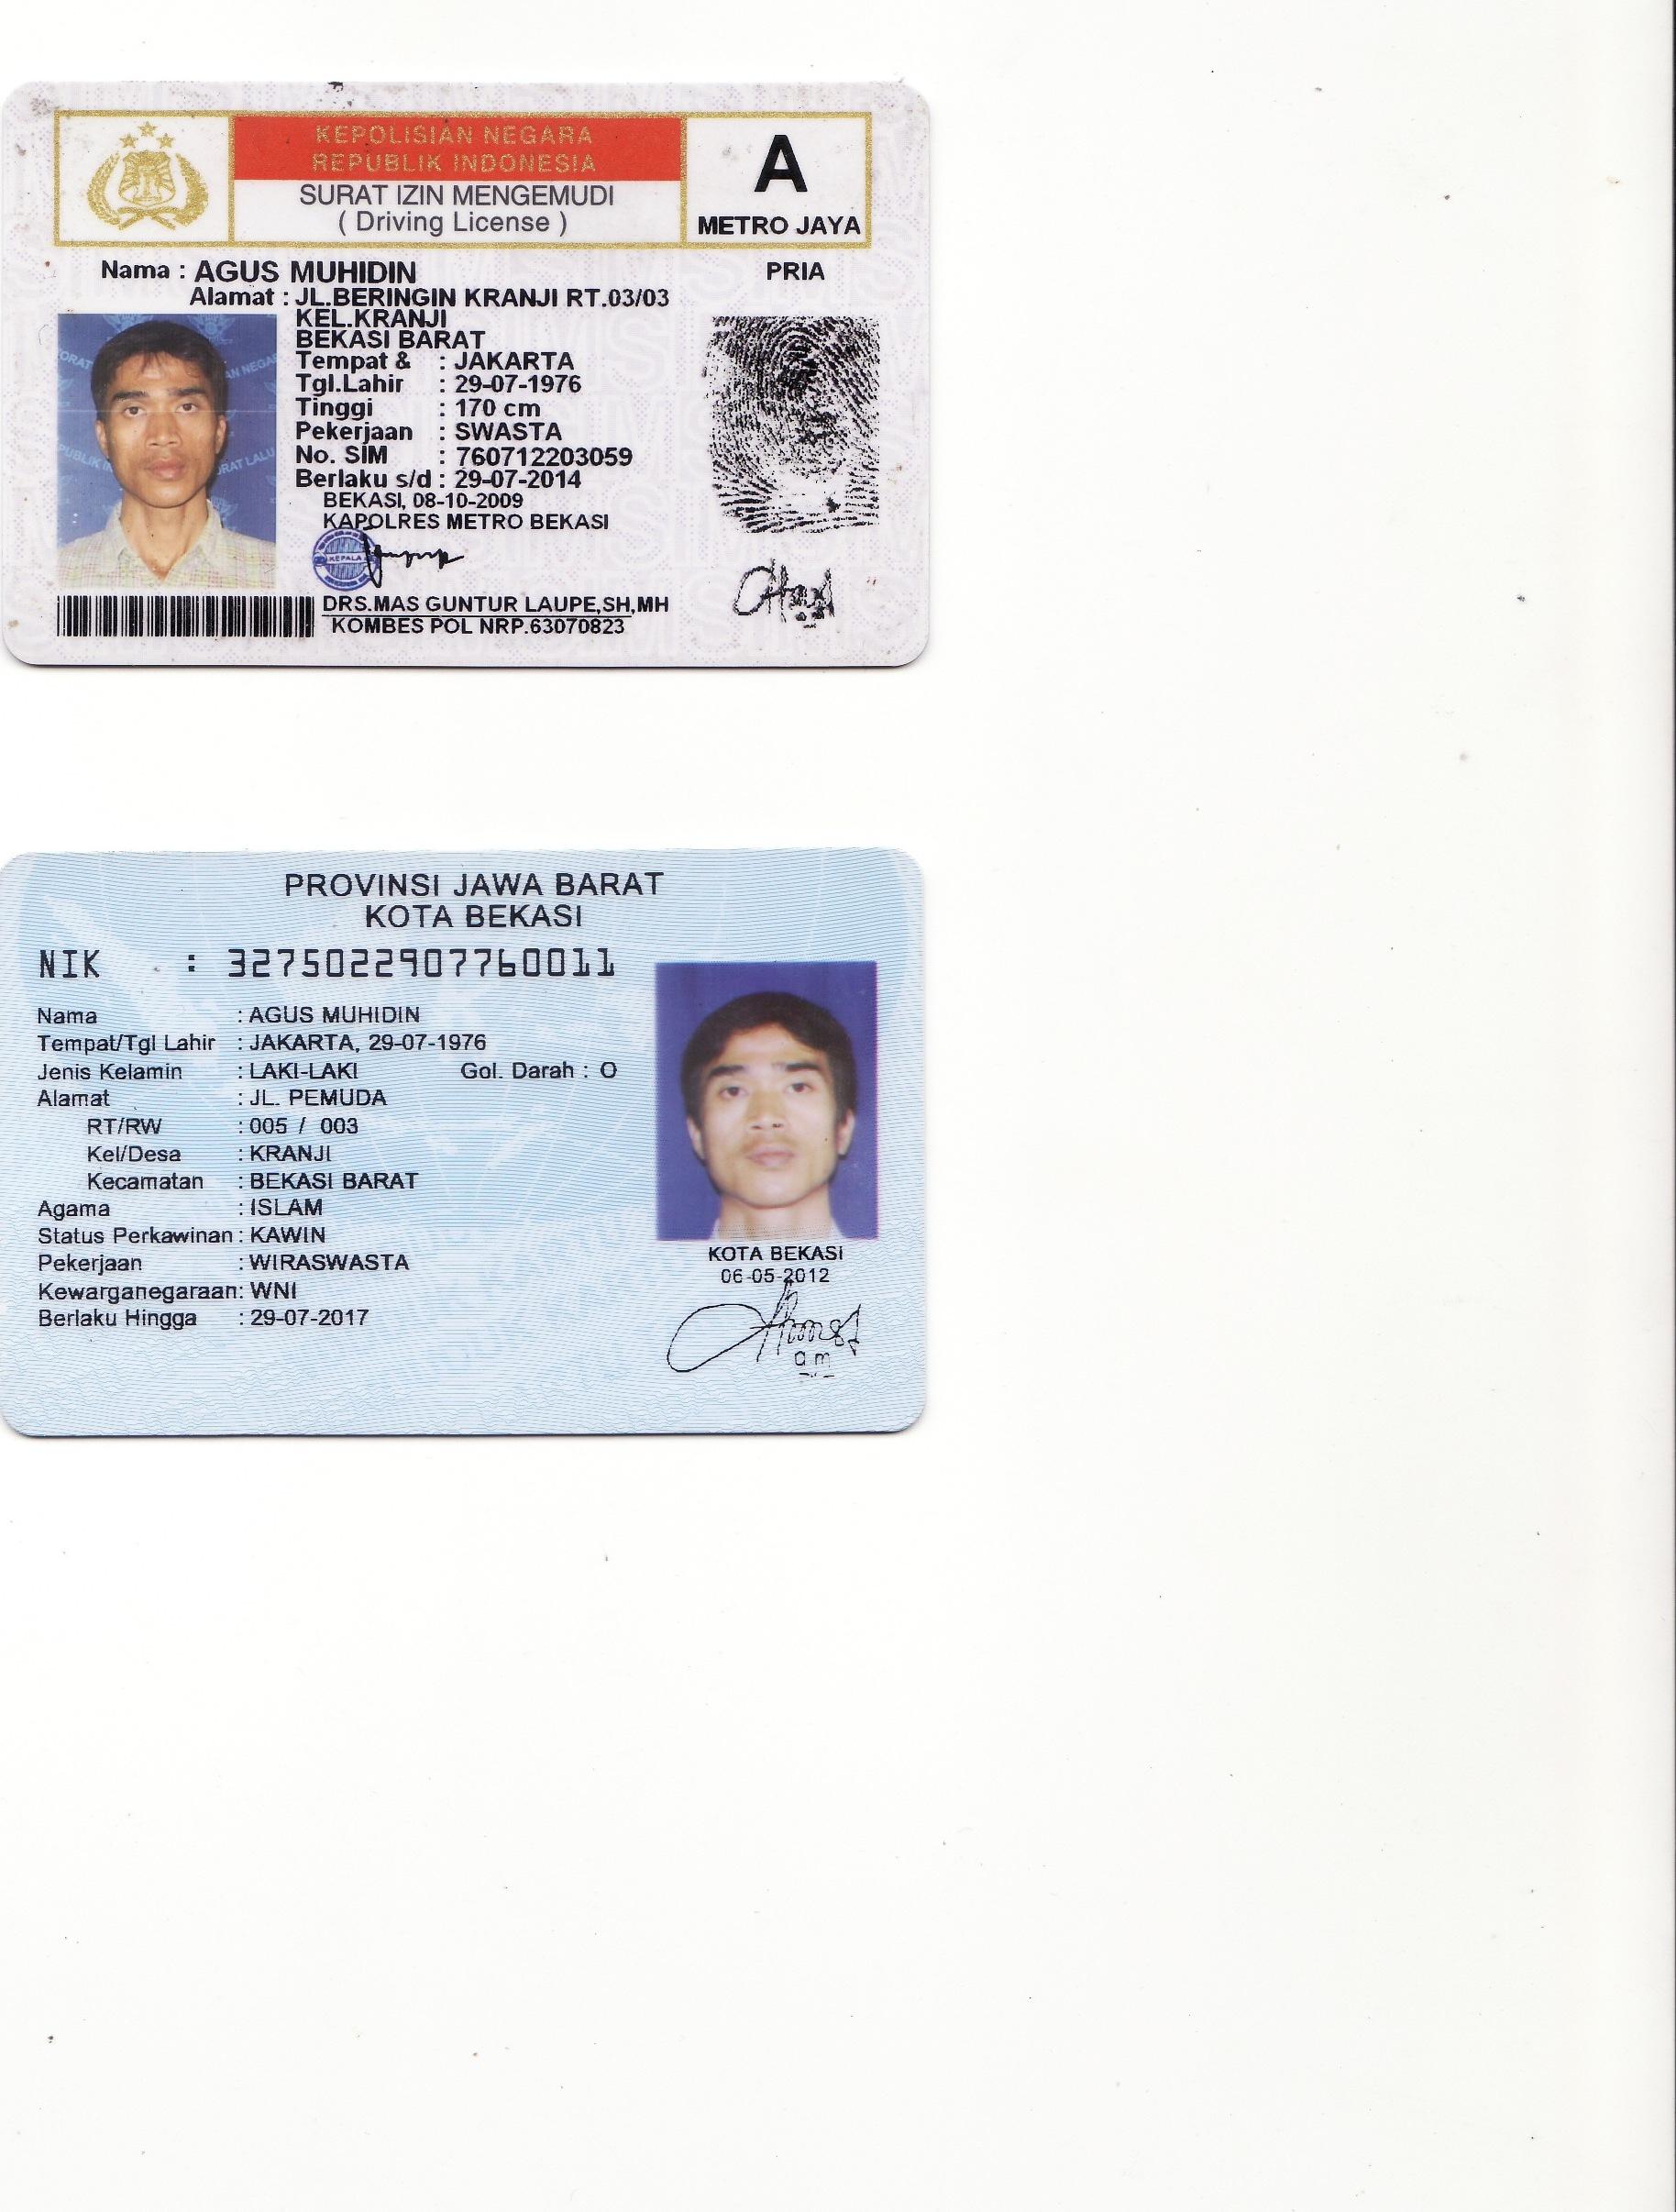 Lowongan Supir Pribadi Jakarta 2013 Rental Mobil Jakarta 021 89451806 0822 405 66644 Pribadi Nama Agus Code 02smbb13 Supir Pribadi Driver Jakarta